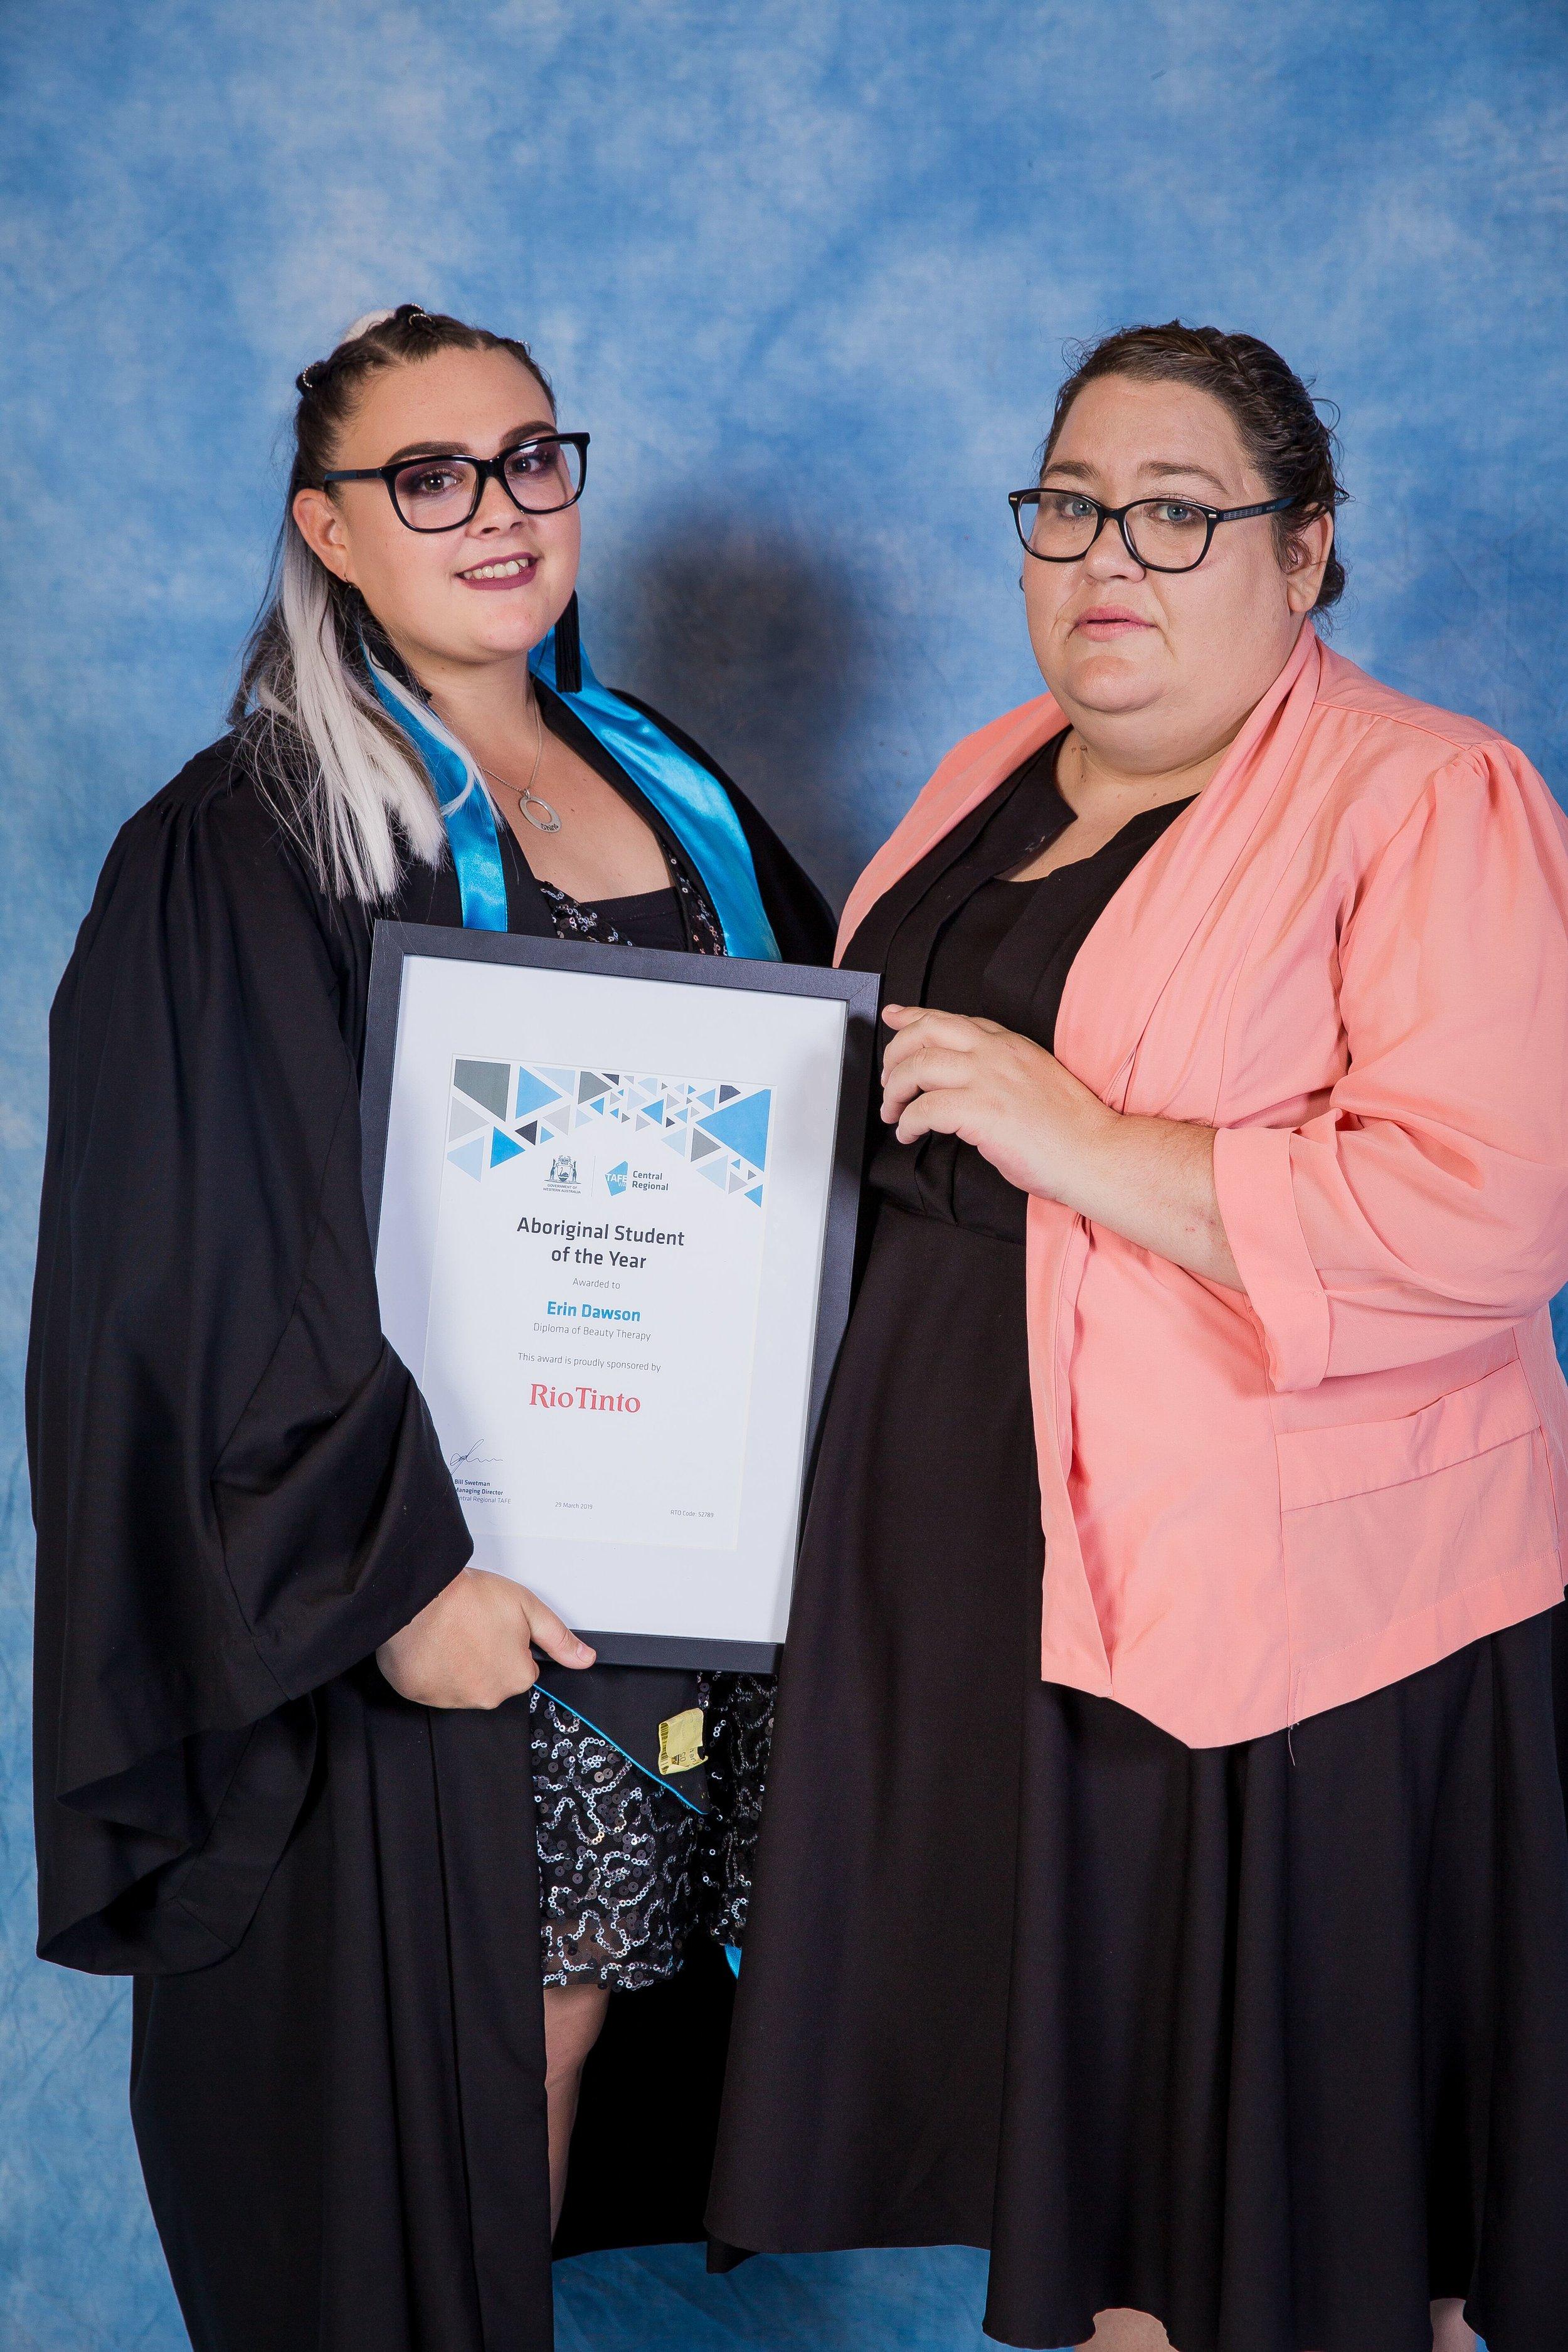 Rio Tinto Aboriginal Student of the Year, Erin Dawson